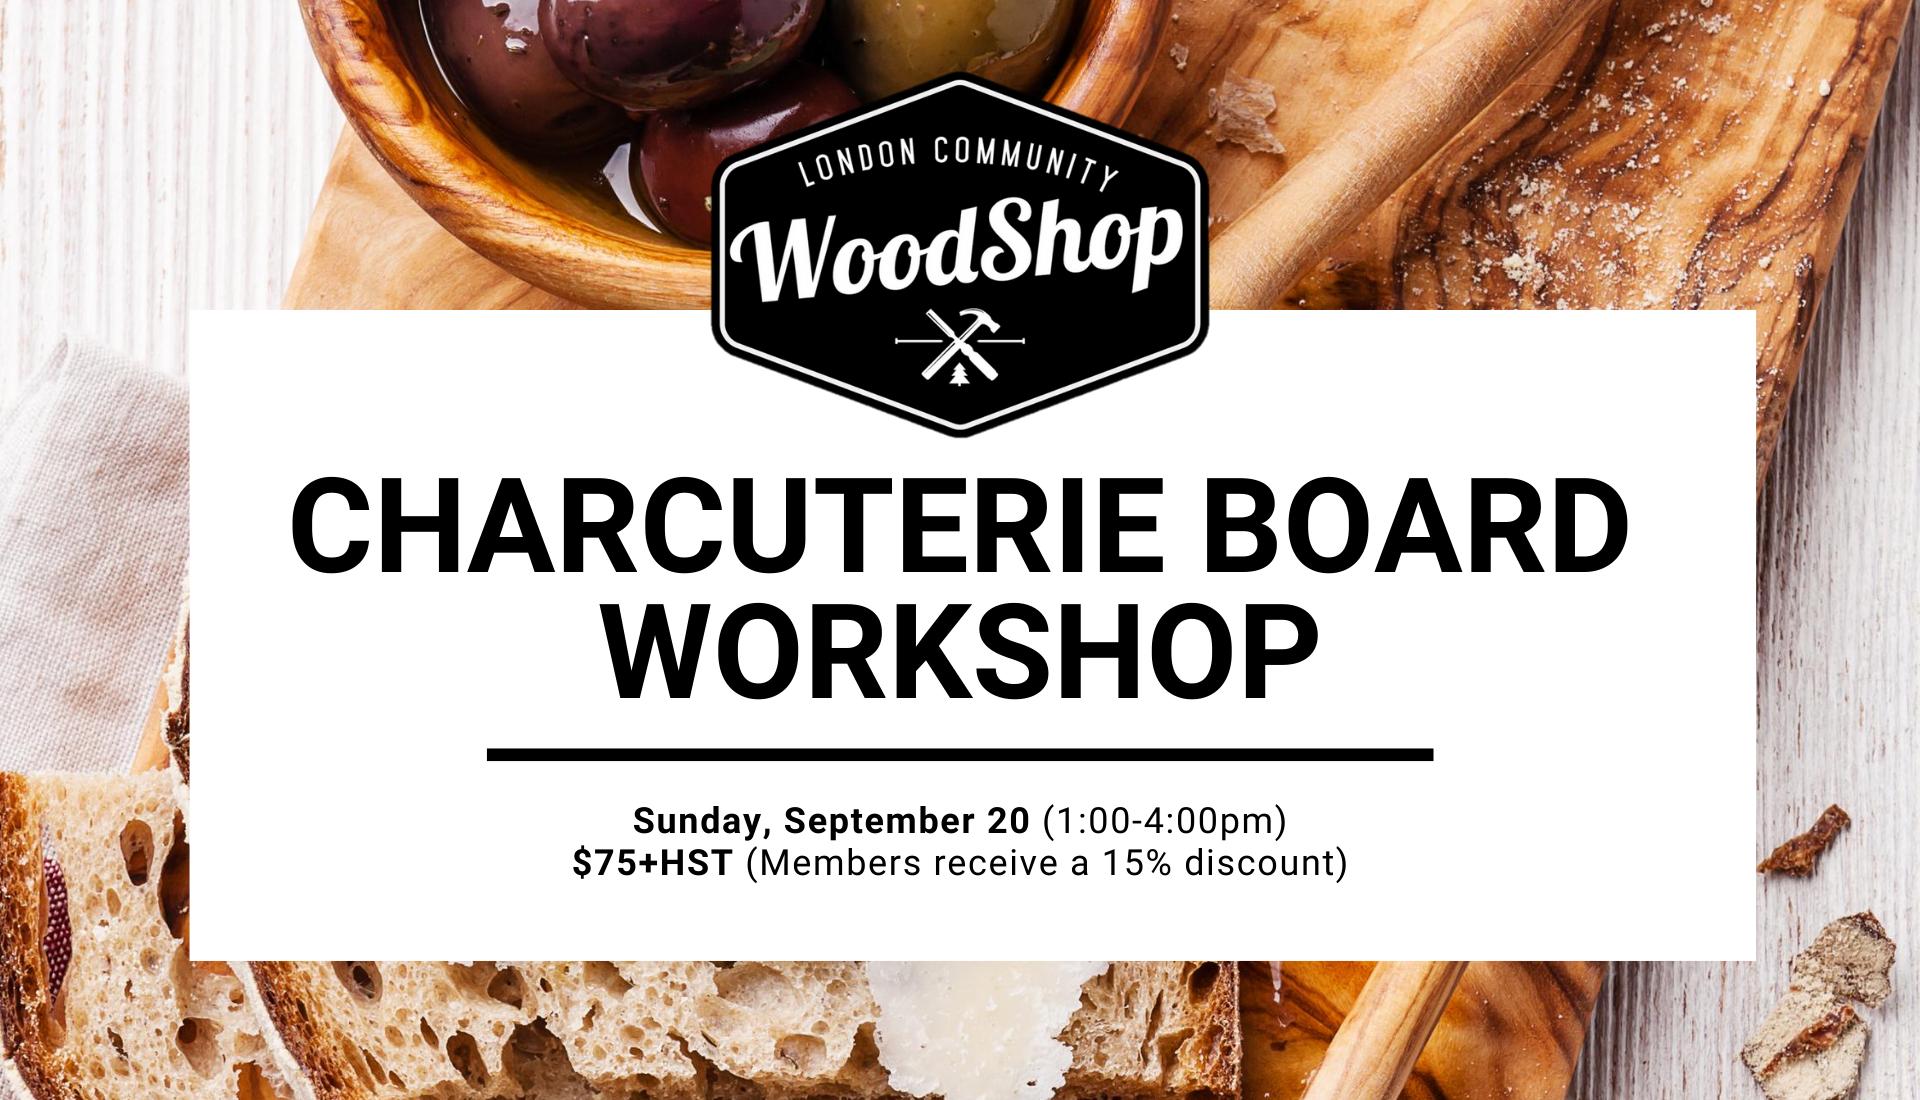 Charcuterie Board - September 20, 2020